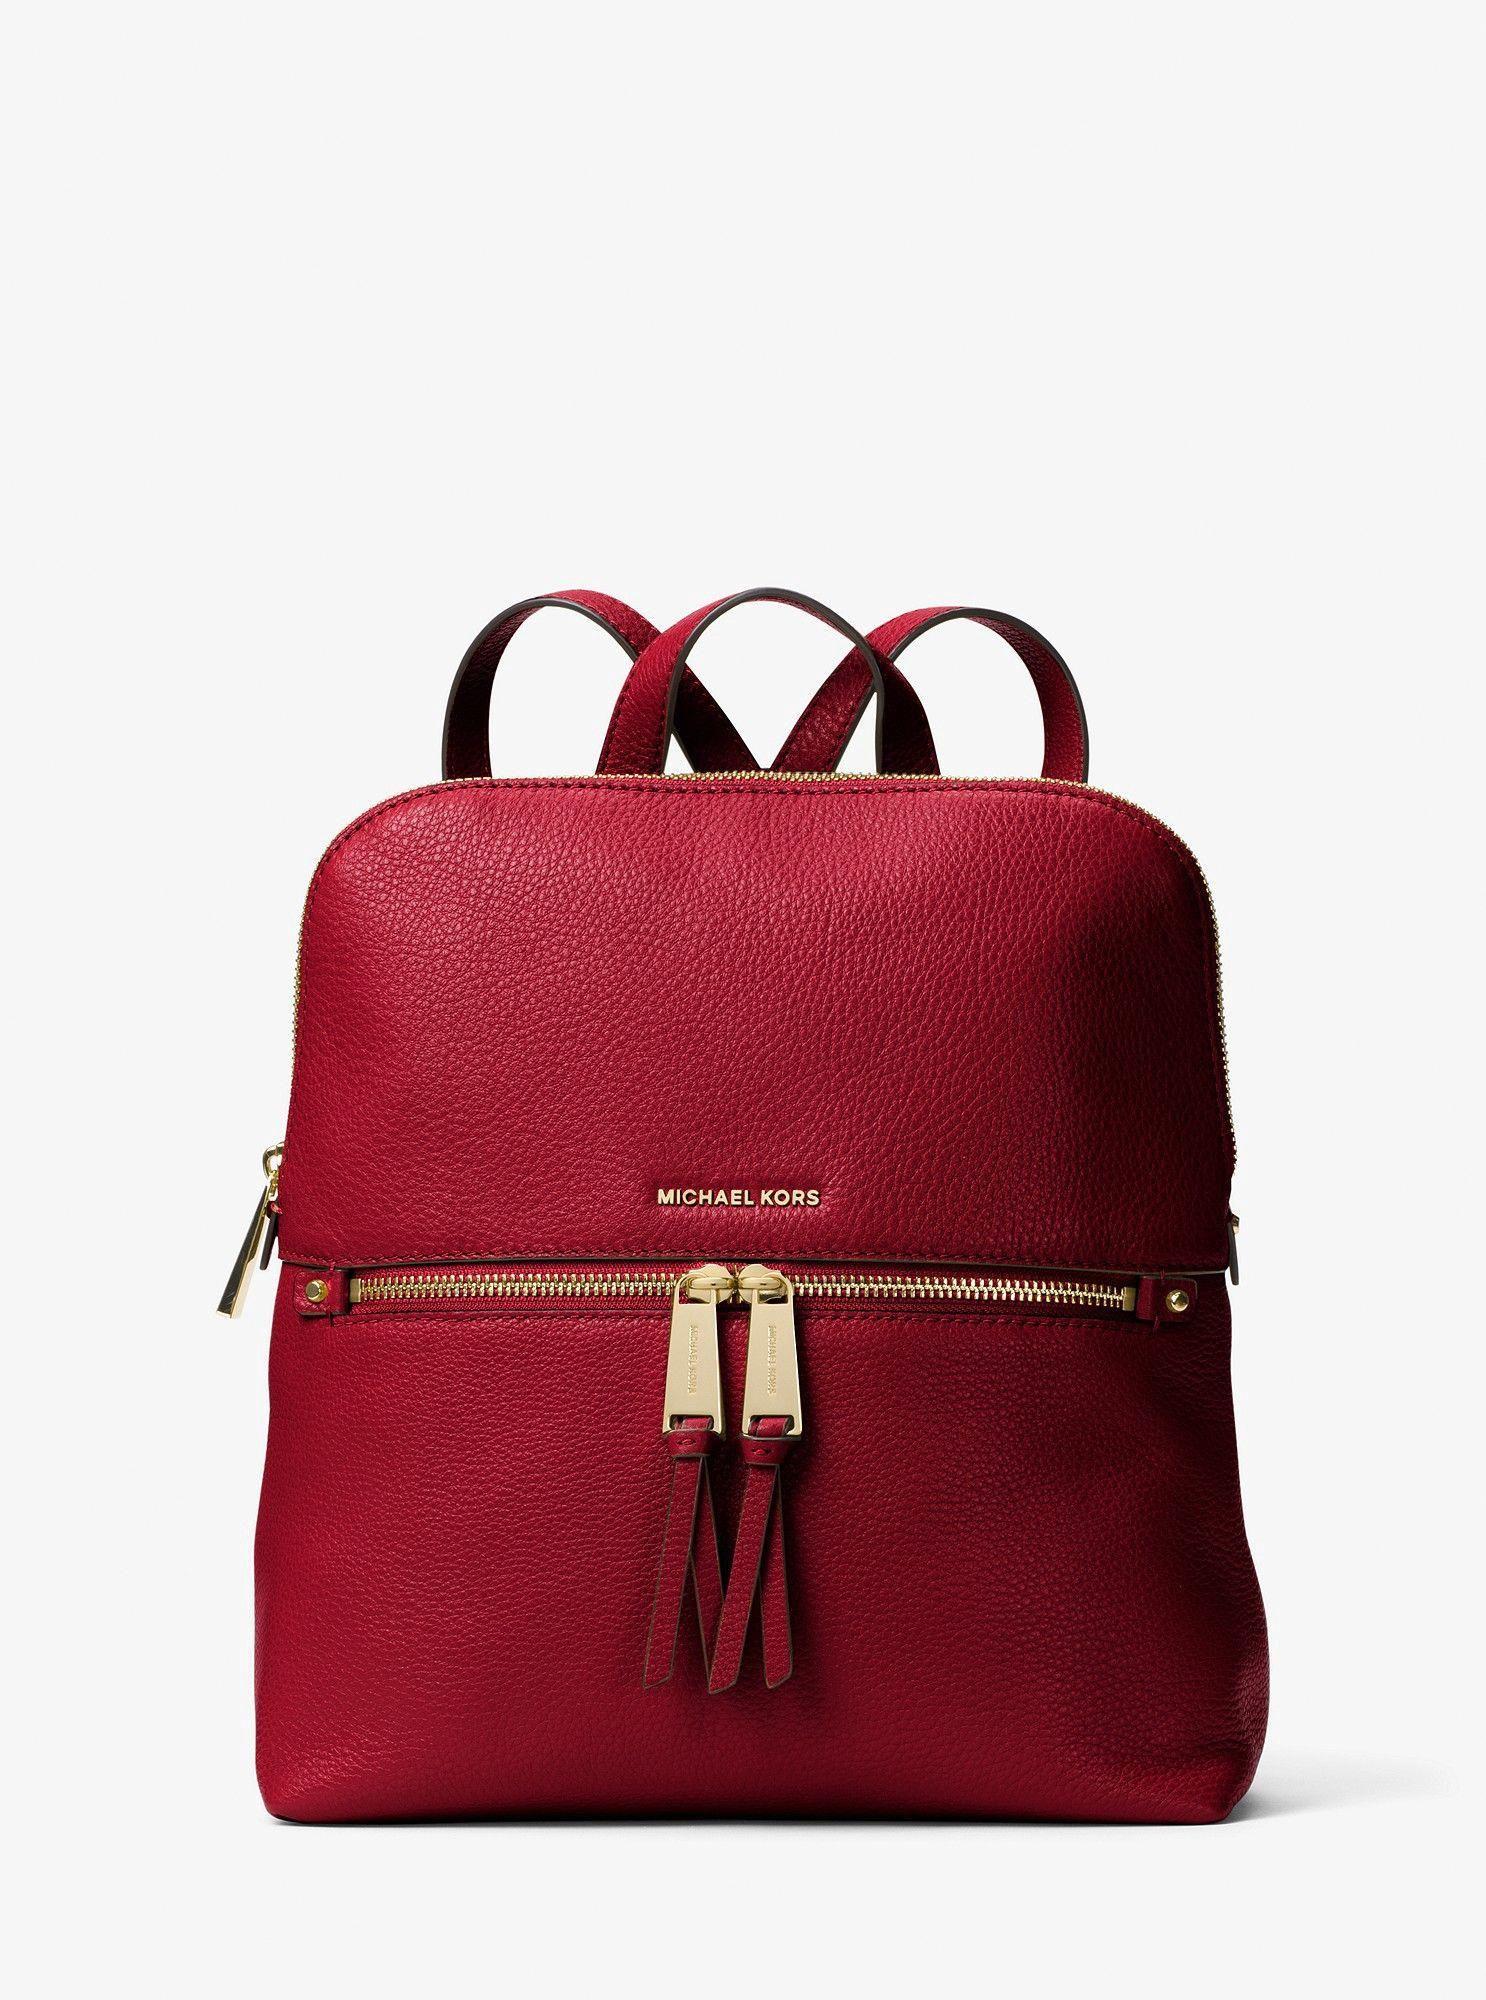 fe5b6dde3545 Michael Kors Rhea Medium Slim Leather Backpack - Acorn  Handbagsmichaelkors